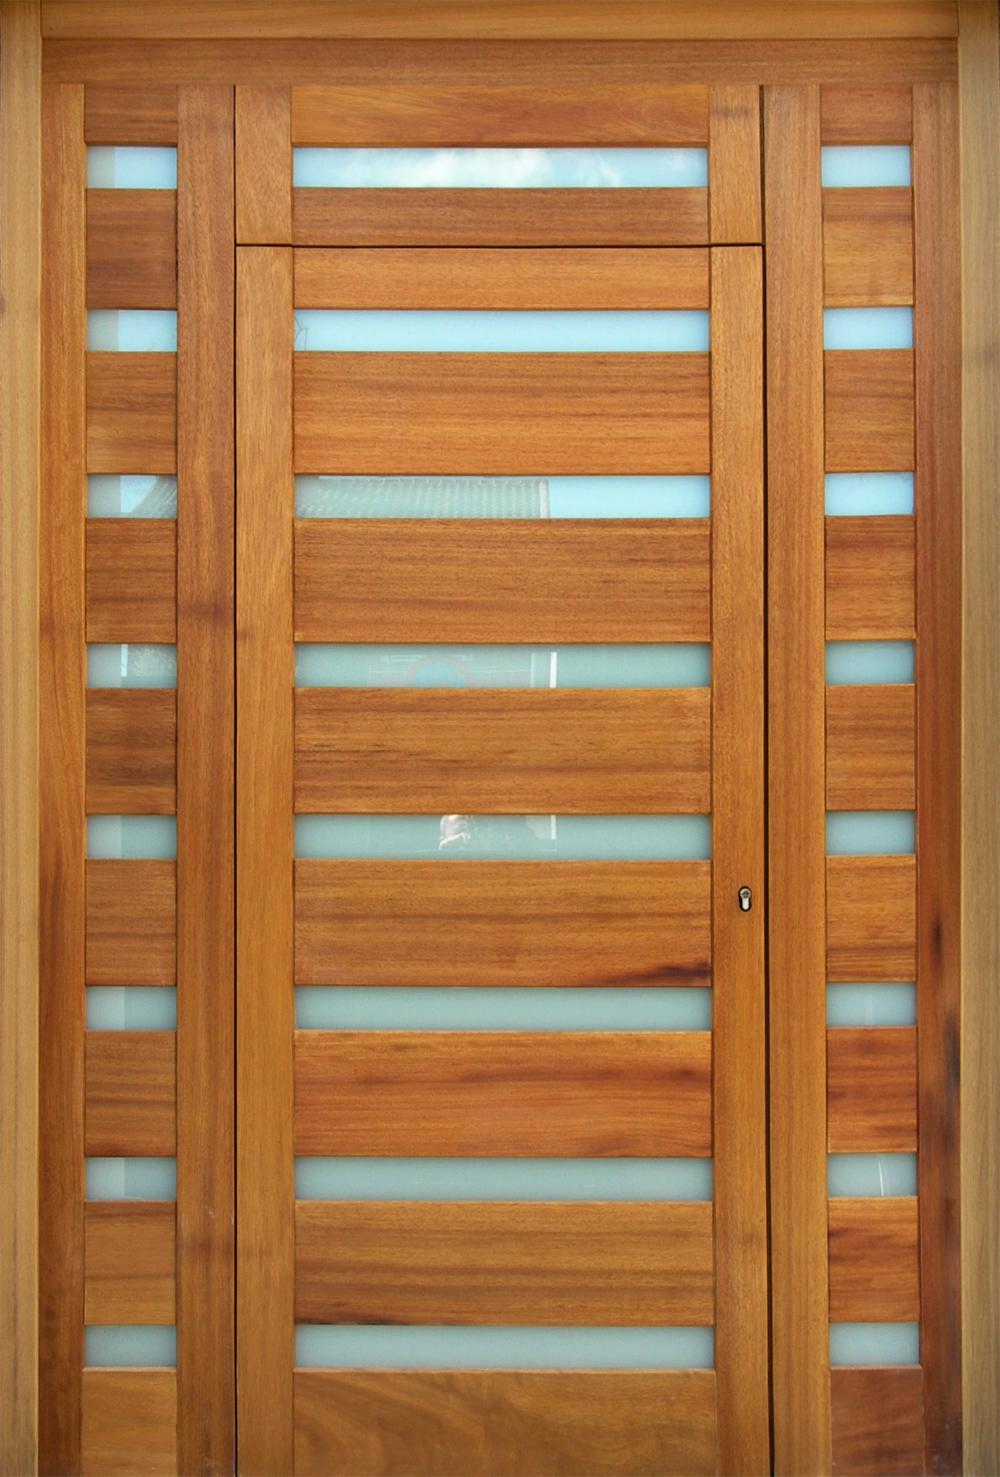 Puertas forjadas joyse puertas forjadas for Disenos puertas de madera exterior